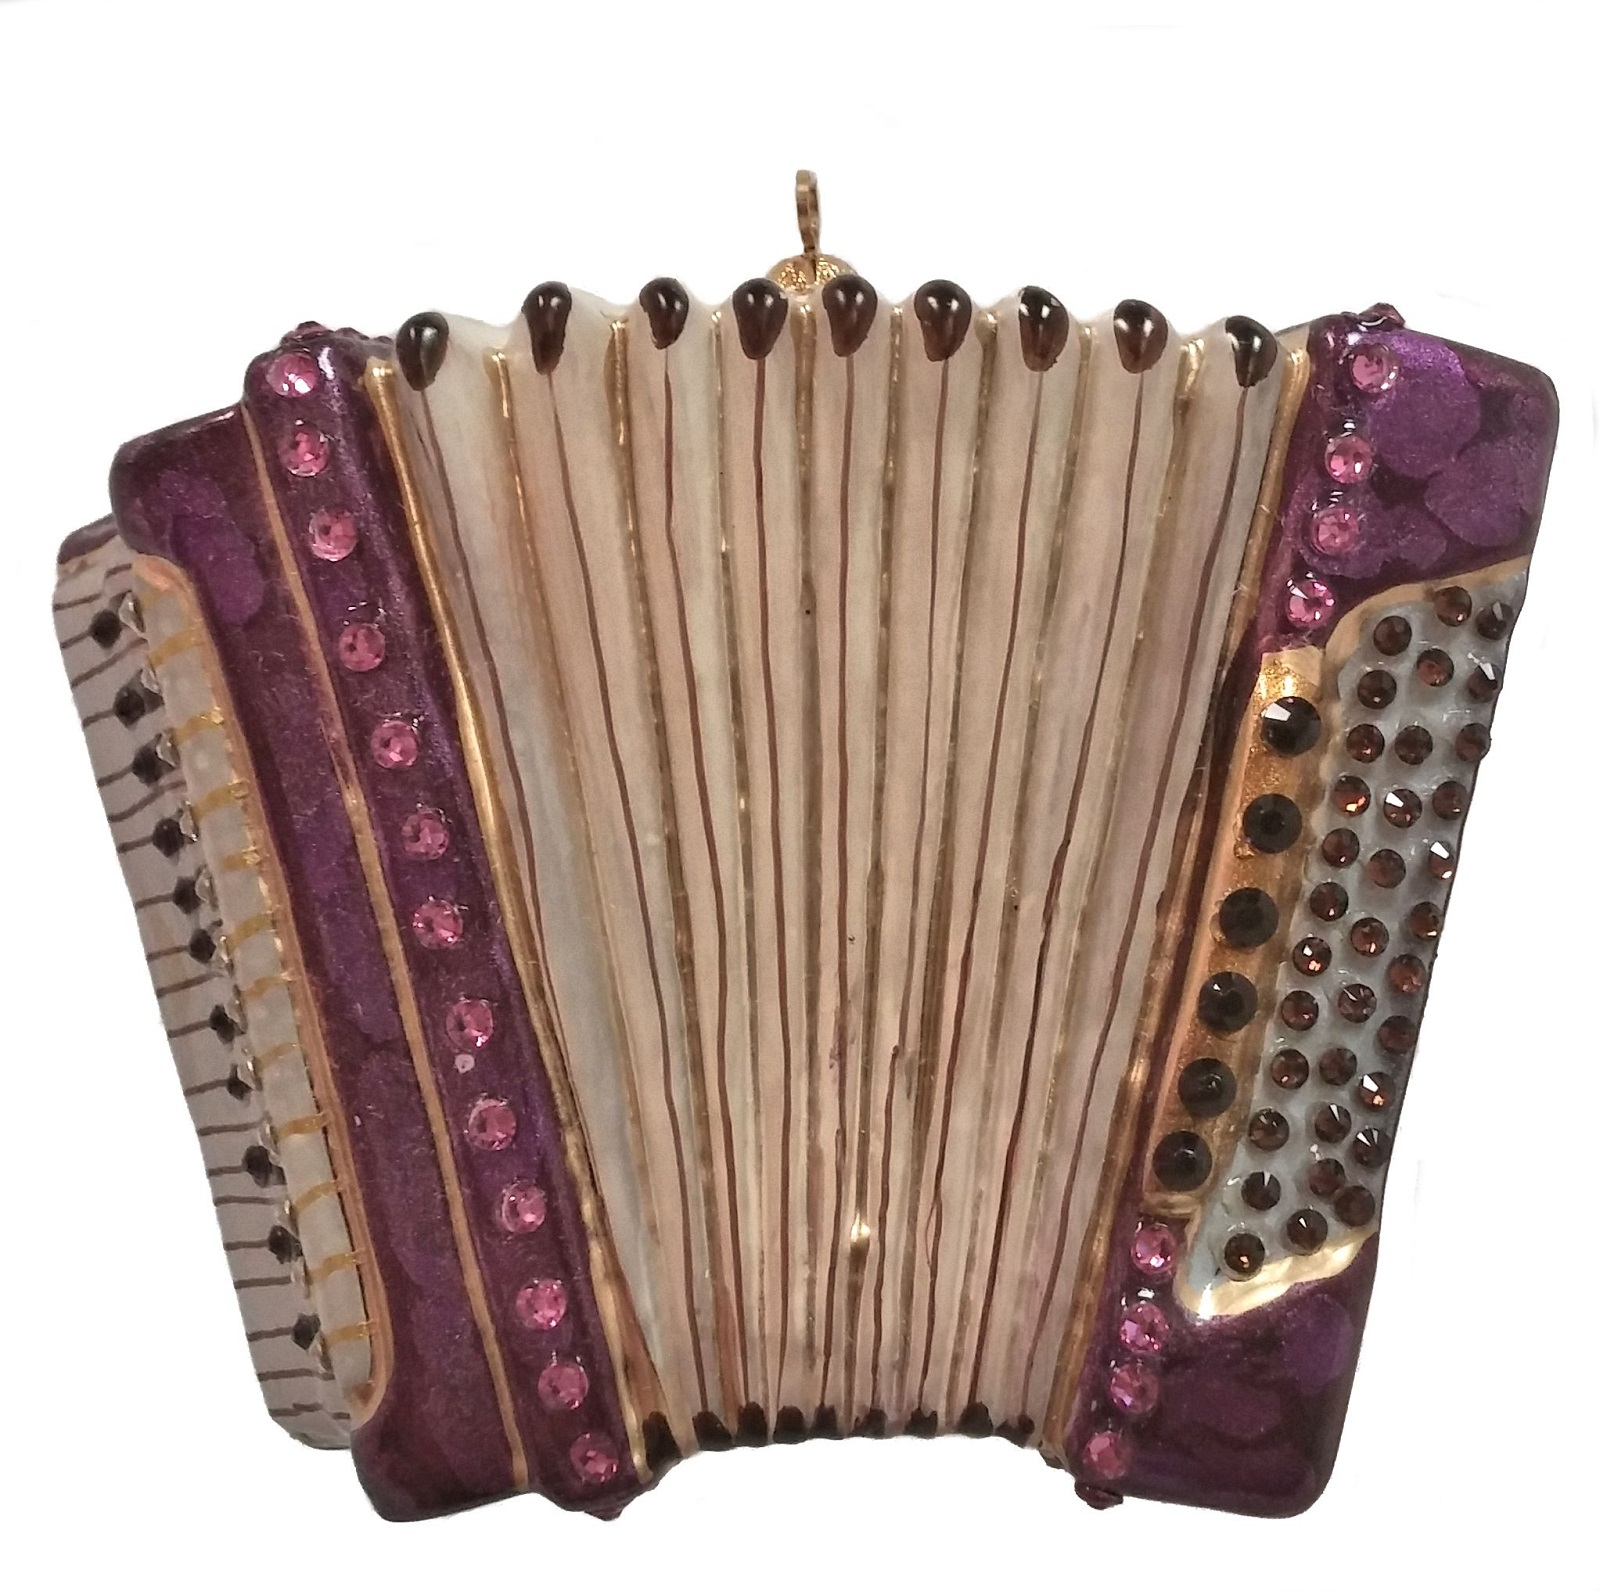 Polish glass ornaments - Accordion Musical Instrument Polish Mouth Blown Glass Christmas Ornament